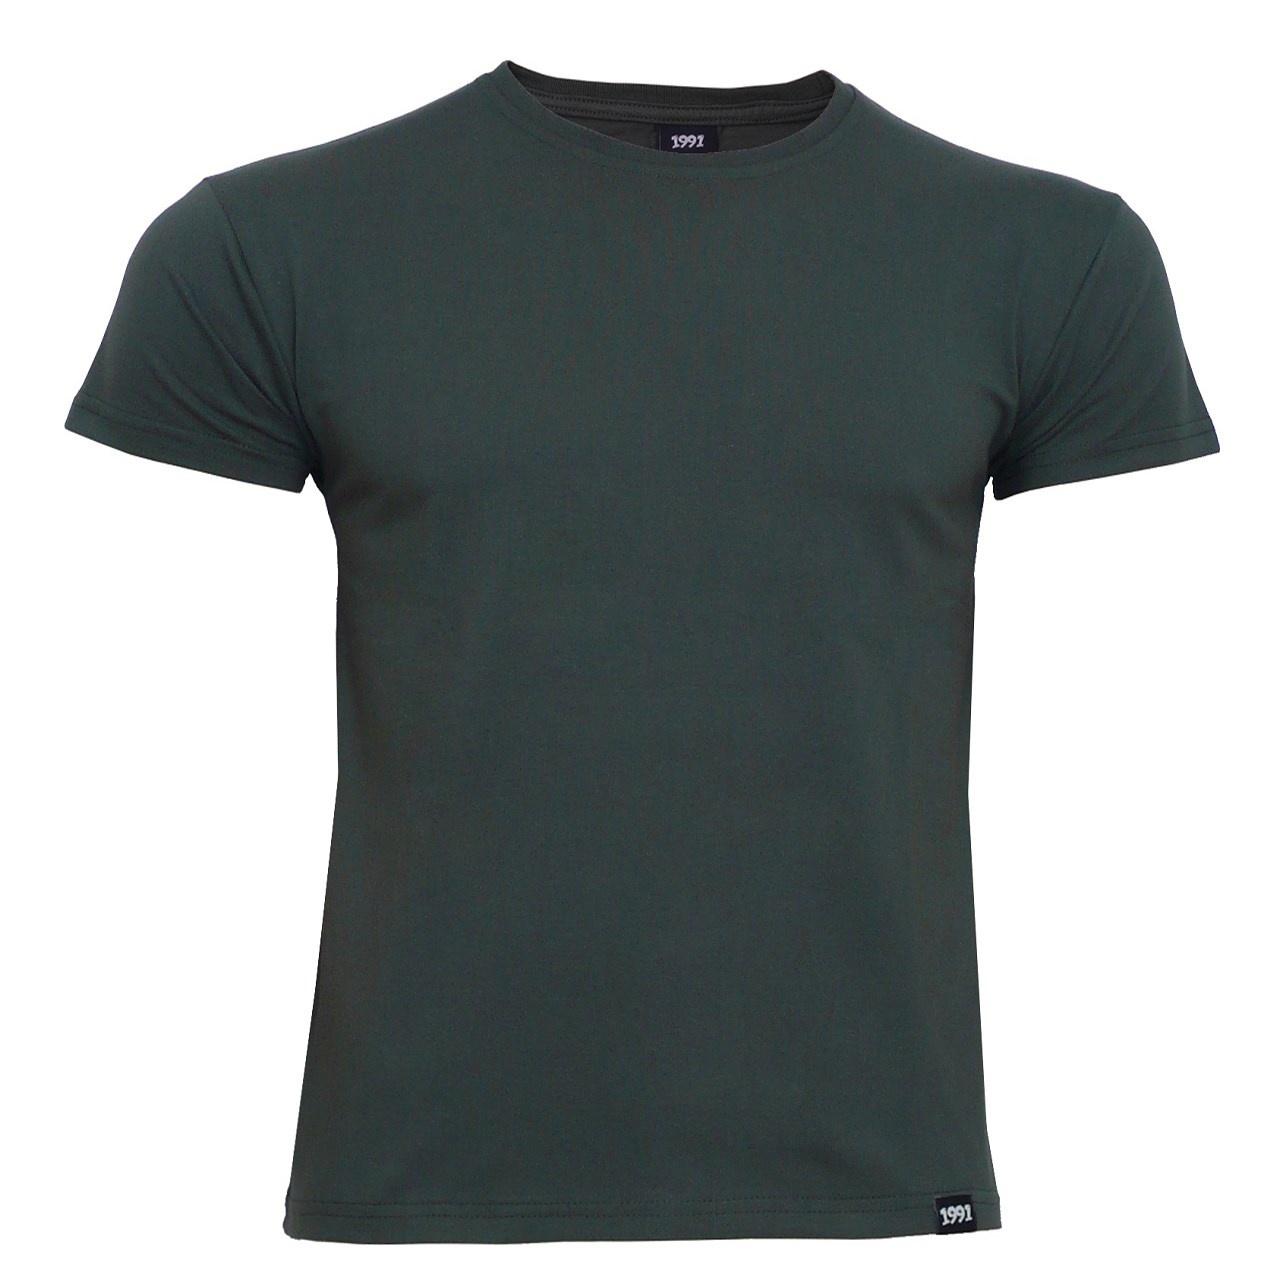 Photo of تی شرت مردانه 1991 اس دبلیو مدل Simplex Green